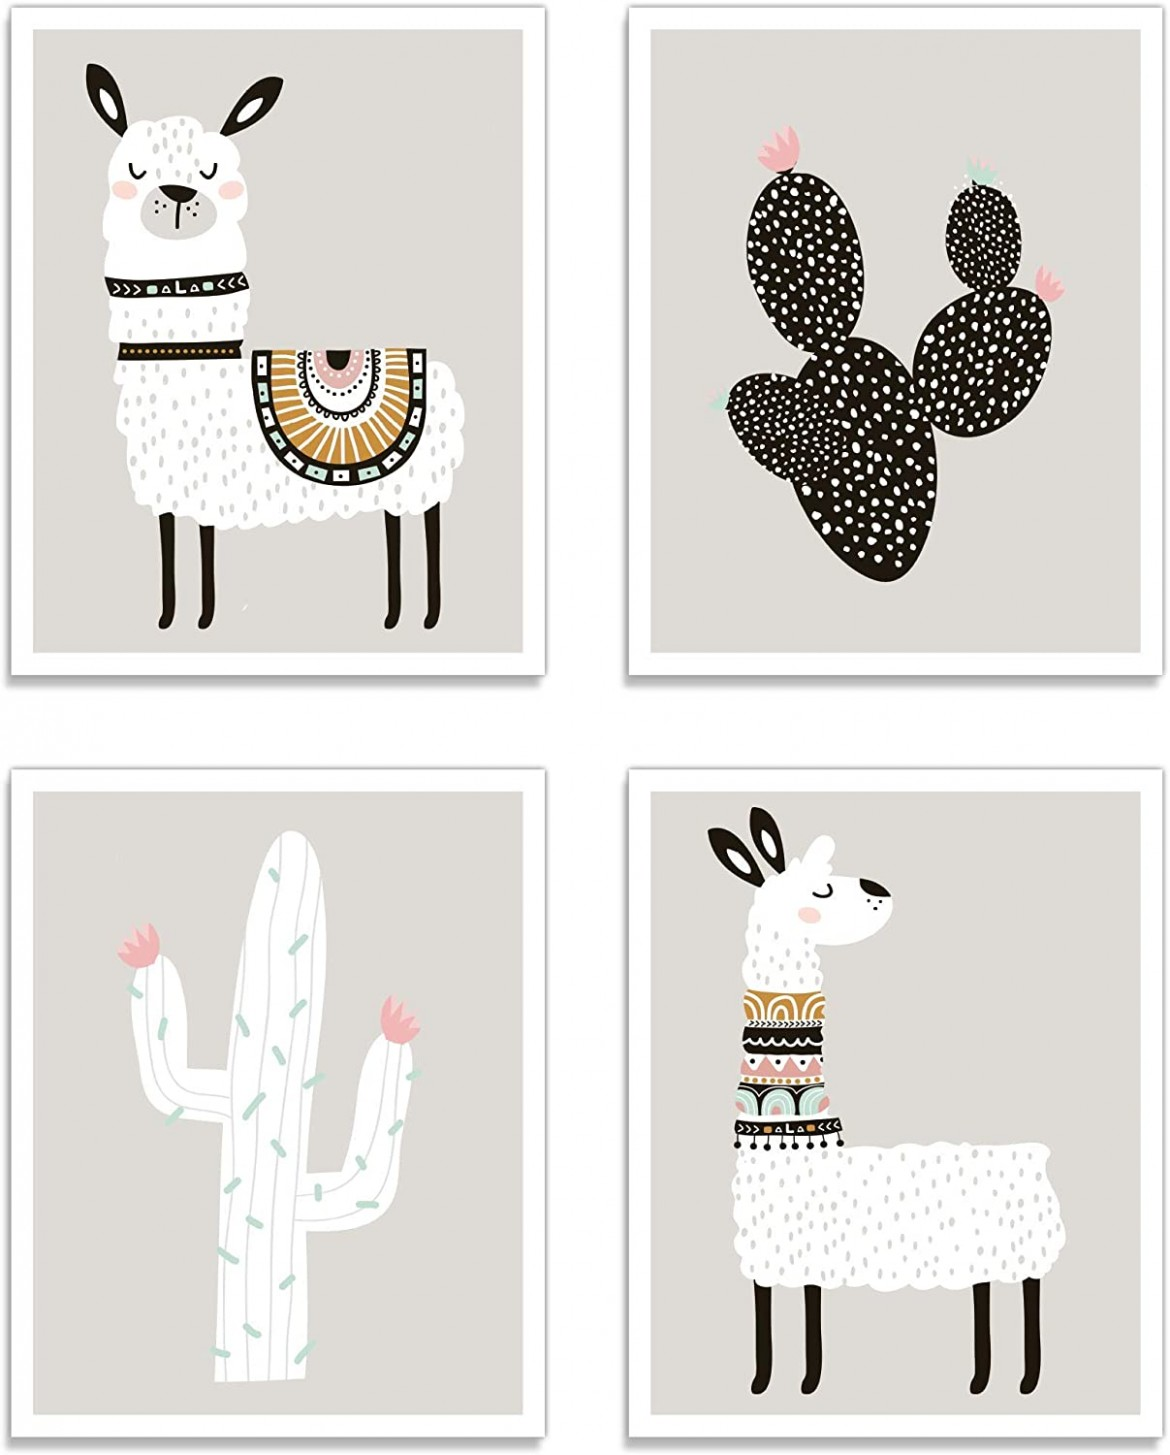 "Llama Wall Decor Art Posters - Set of 10 (10"" x 100"") Professional Grade  Prints (Llama & Cactus) for Baby Room, Boy/Girl Room, Kids, Nursery Room  Decor,  - Baby Room Posters"